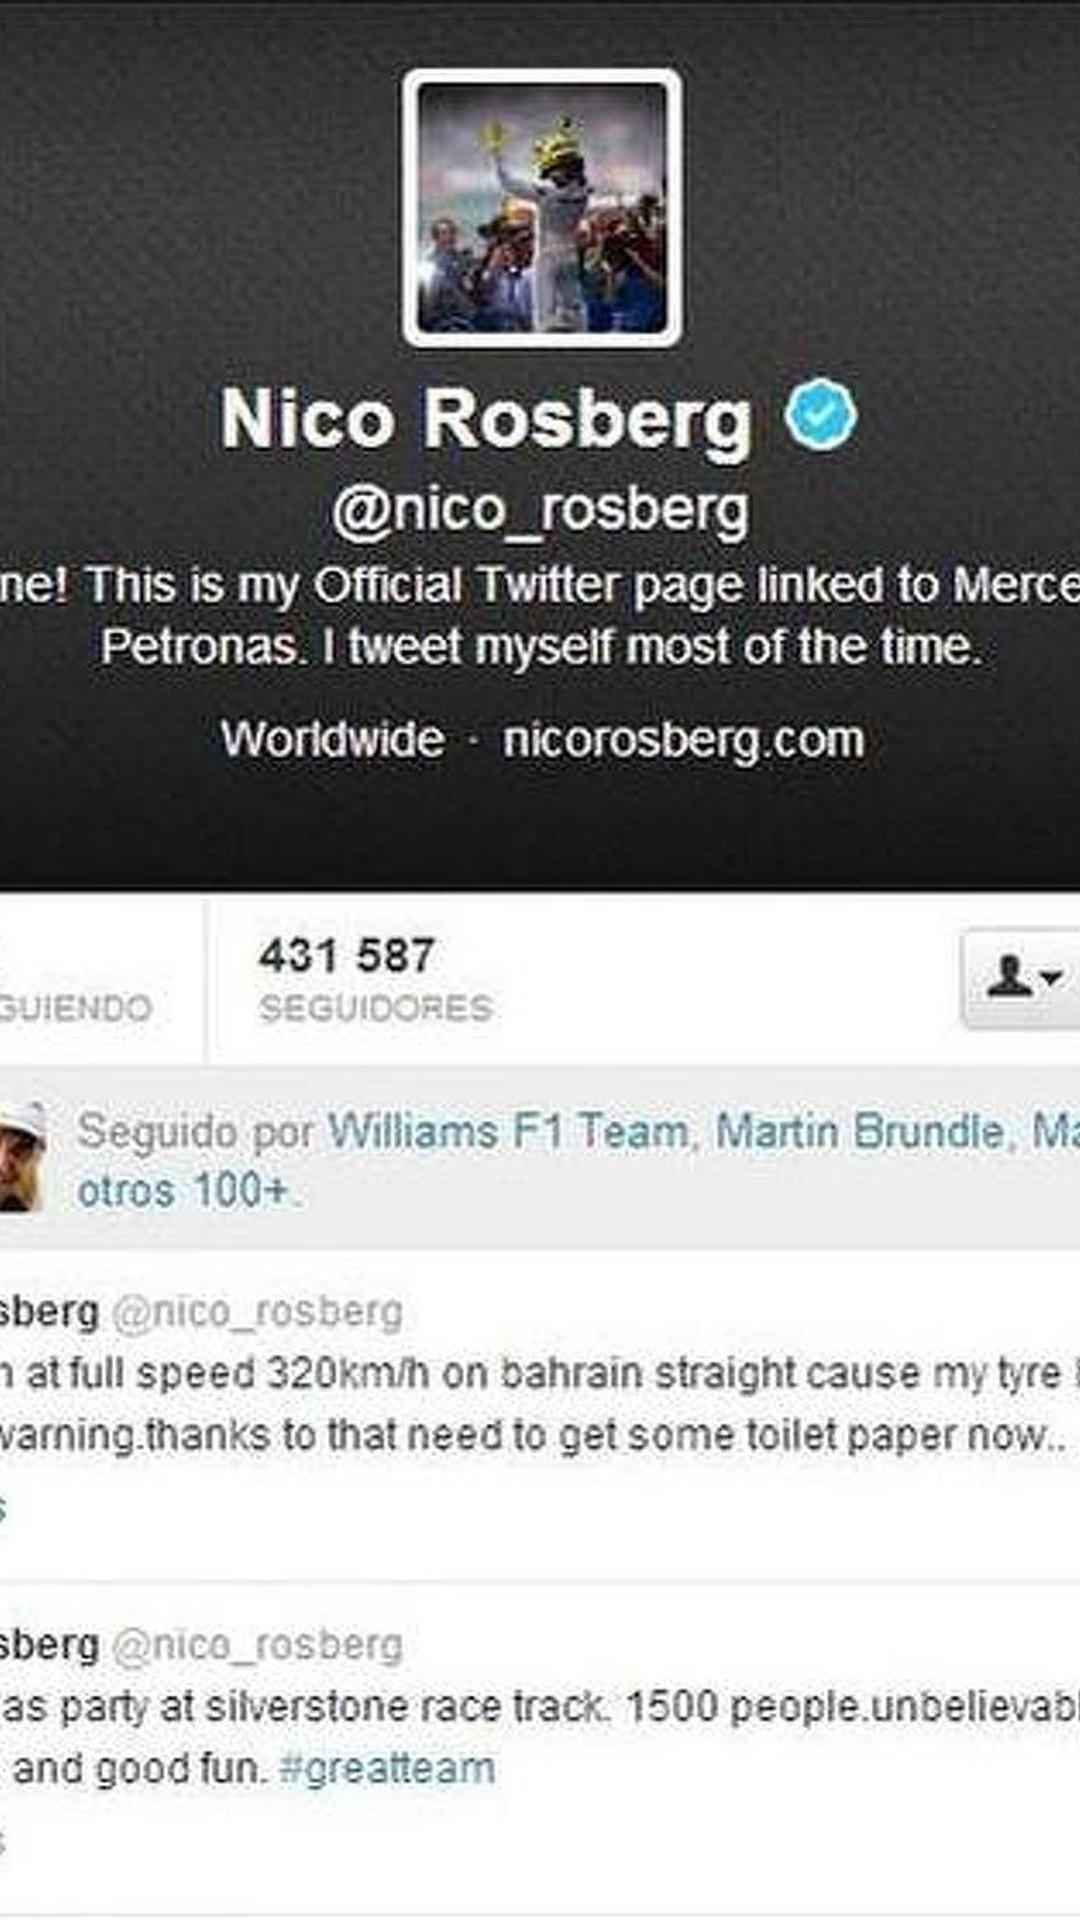 Rosberg reveals tyre failure at 320kmh in Bahrain testing